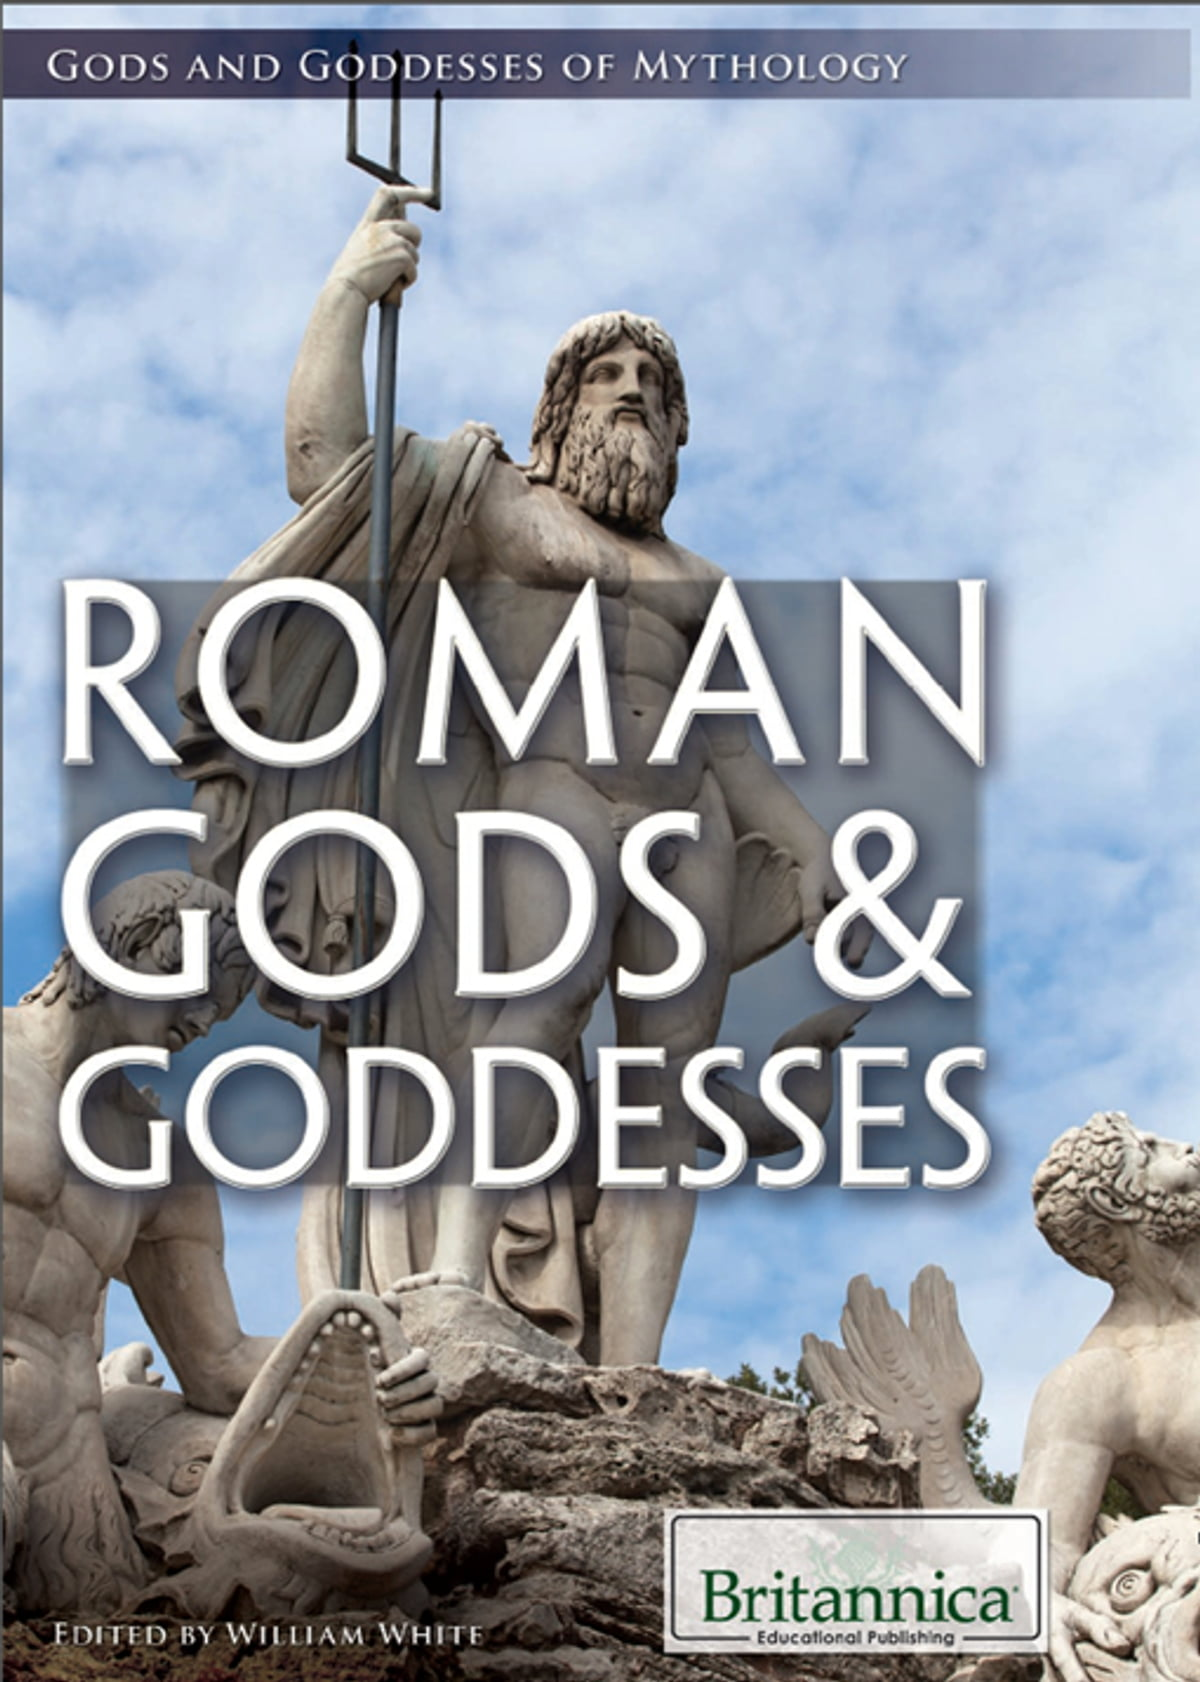 Roman Gods Amp Goddesses Ebook By William White And Nicholas